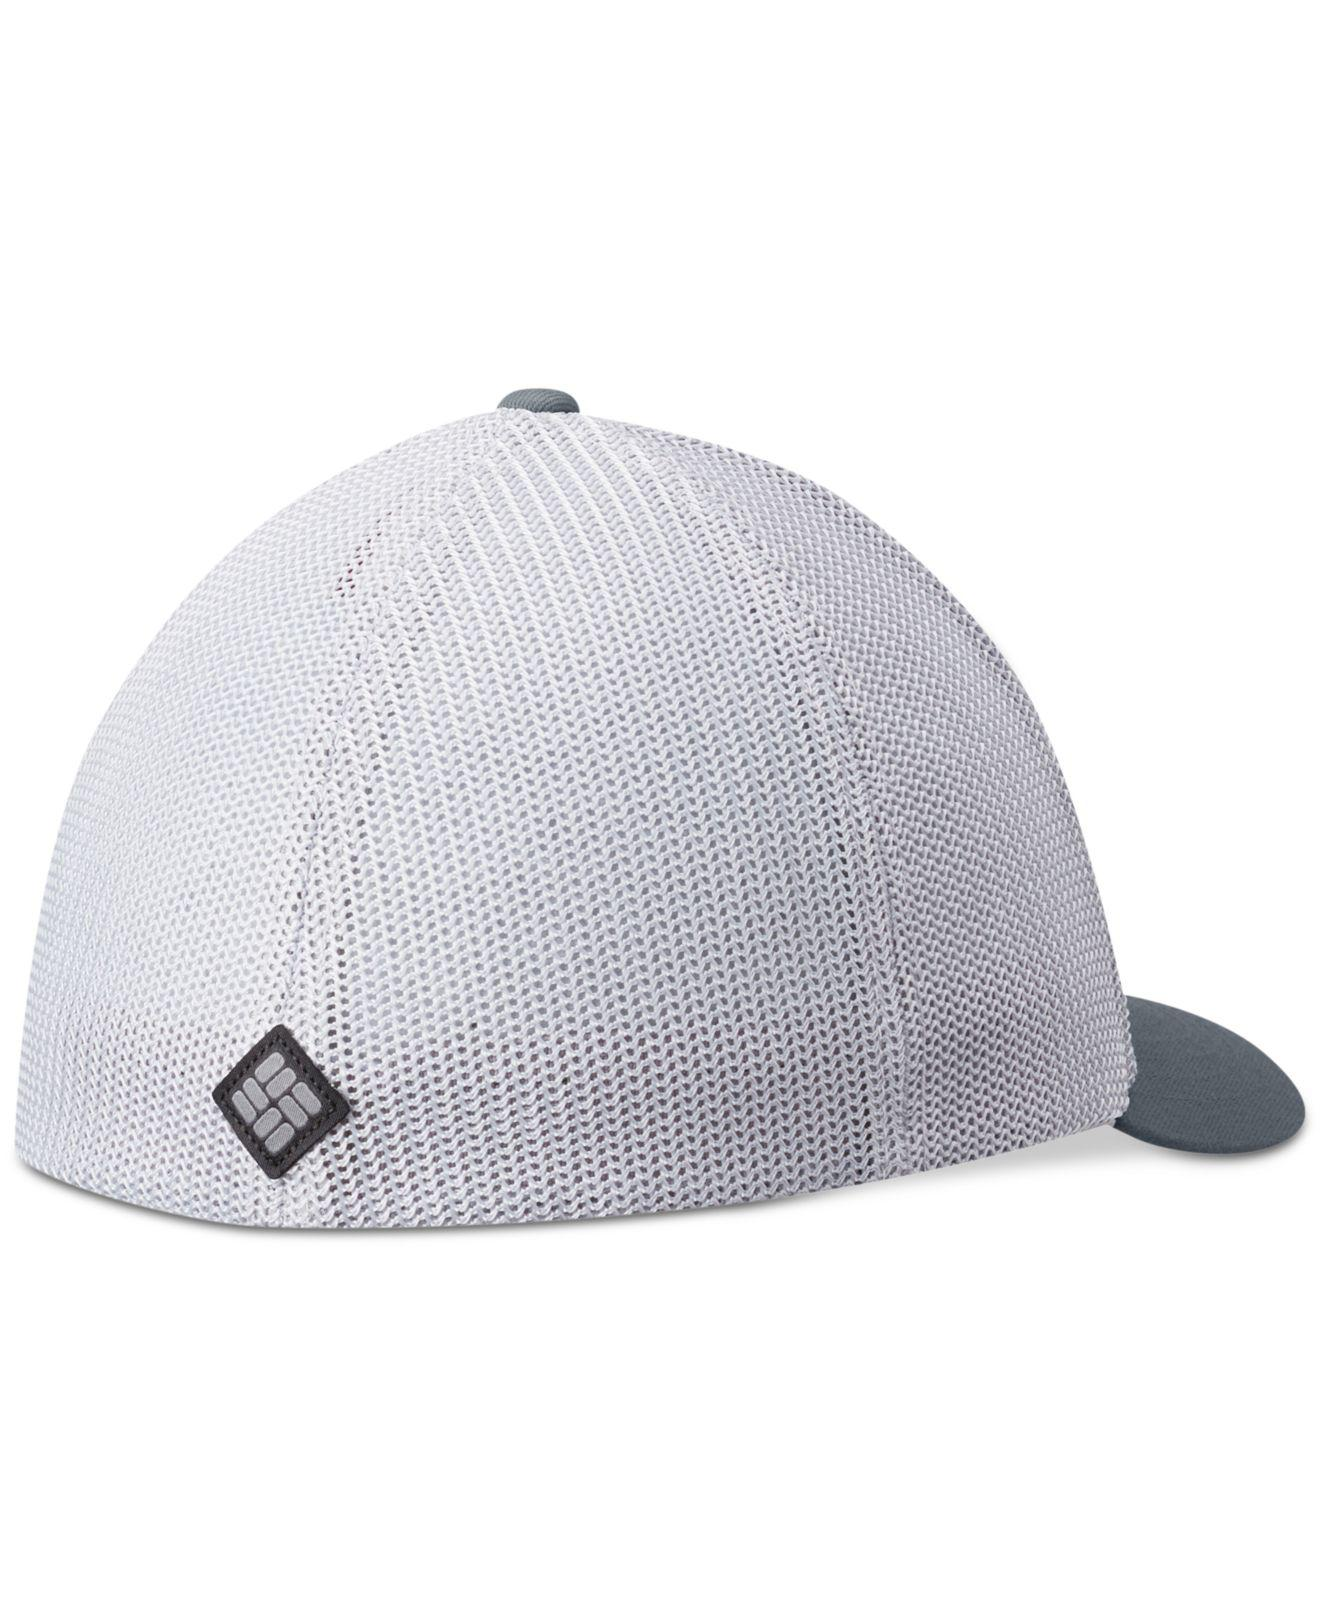 56131746103 Lyst - Columbia Tree Flag Mesh Flexfit Cap in Gray for Men